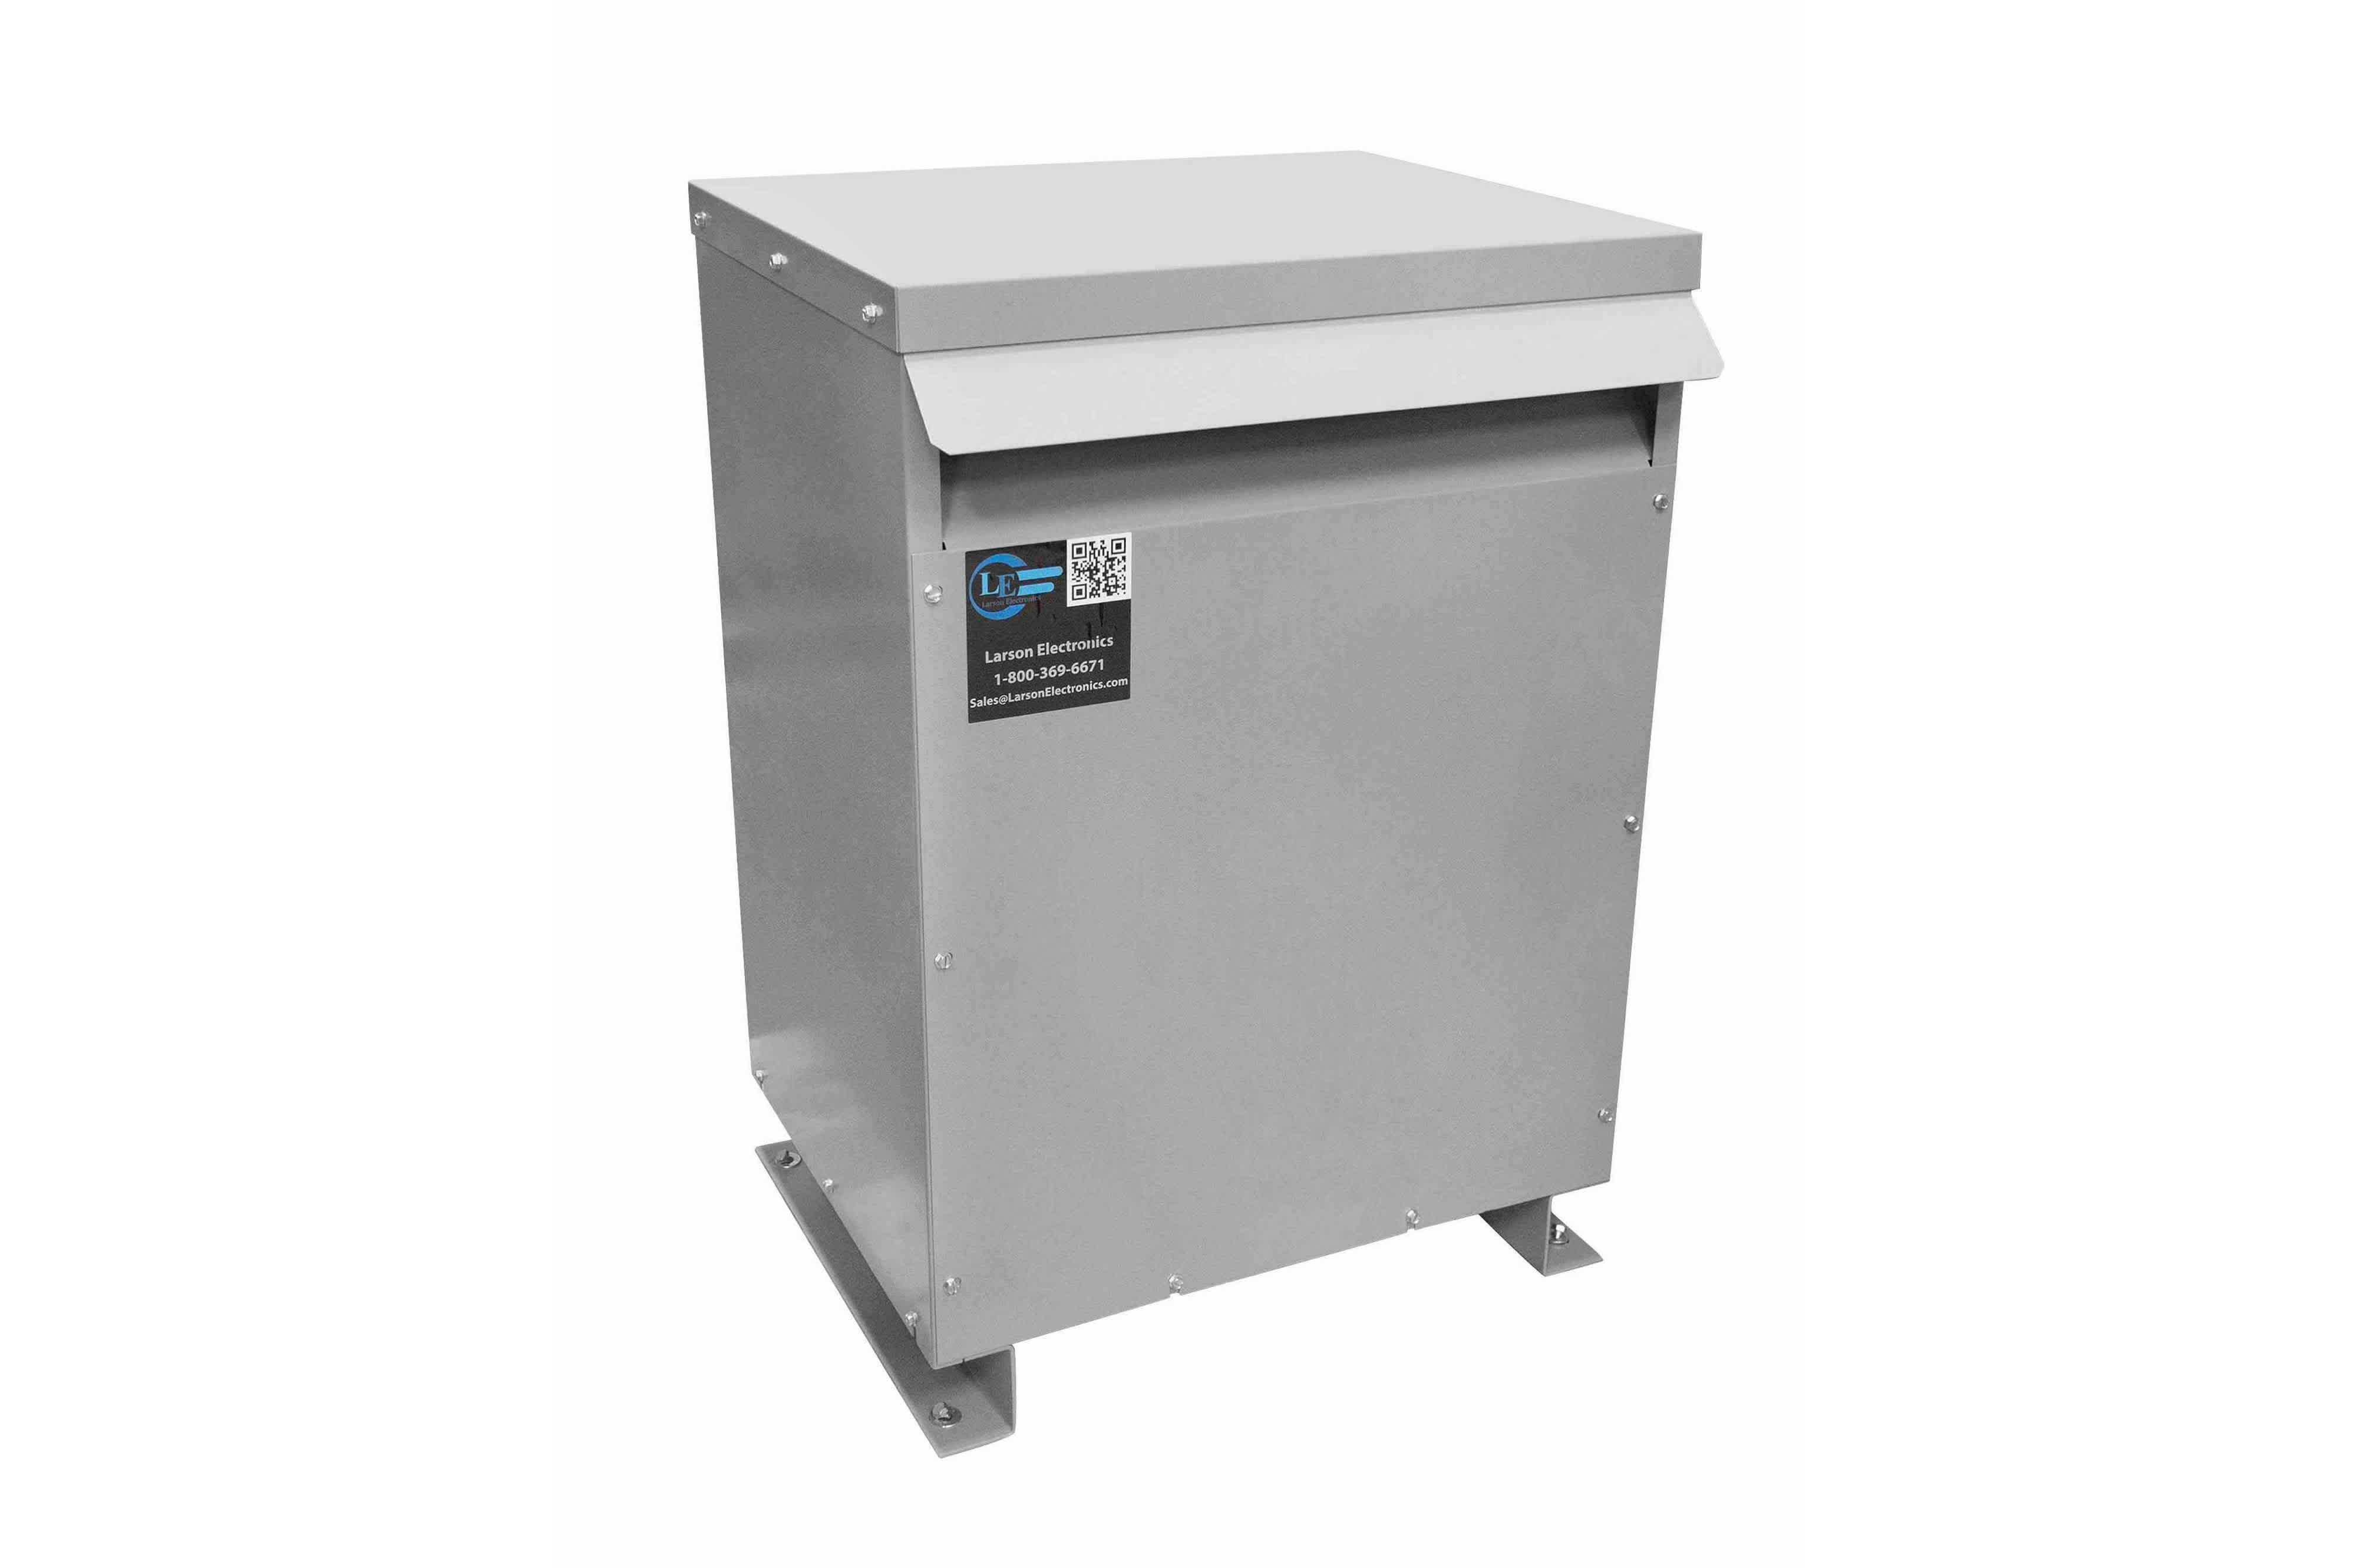 750 kVA 3PH Isolation Transformer, 575V Wye Primary, 480V Delta Secondary, N3R, Ventilated, 60 Hz